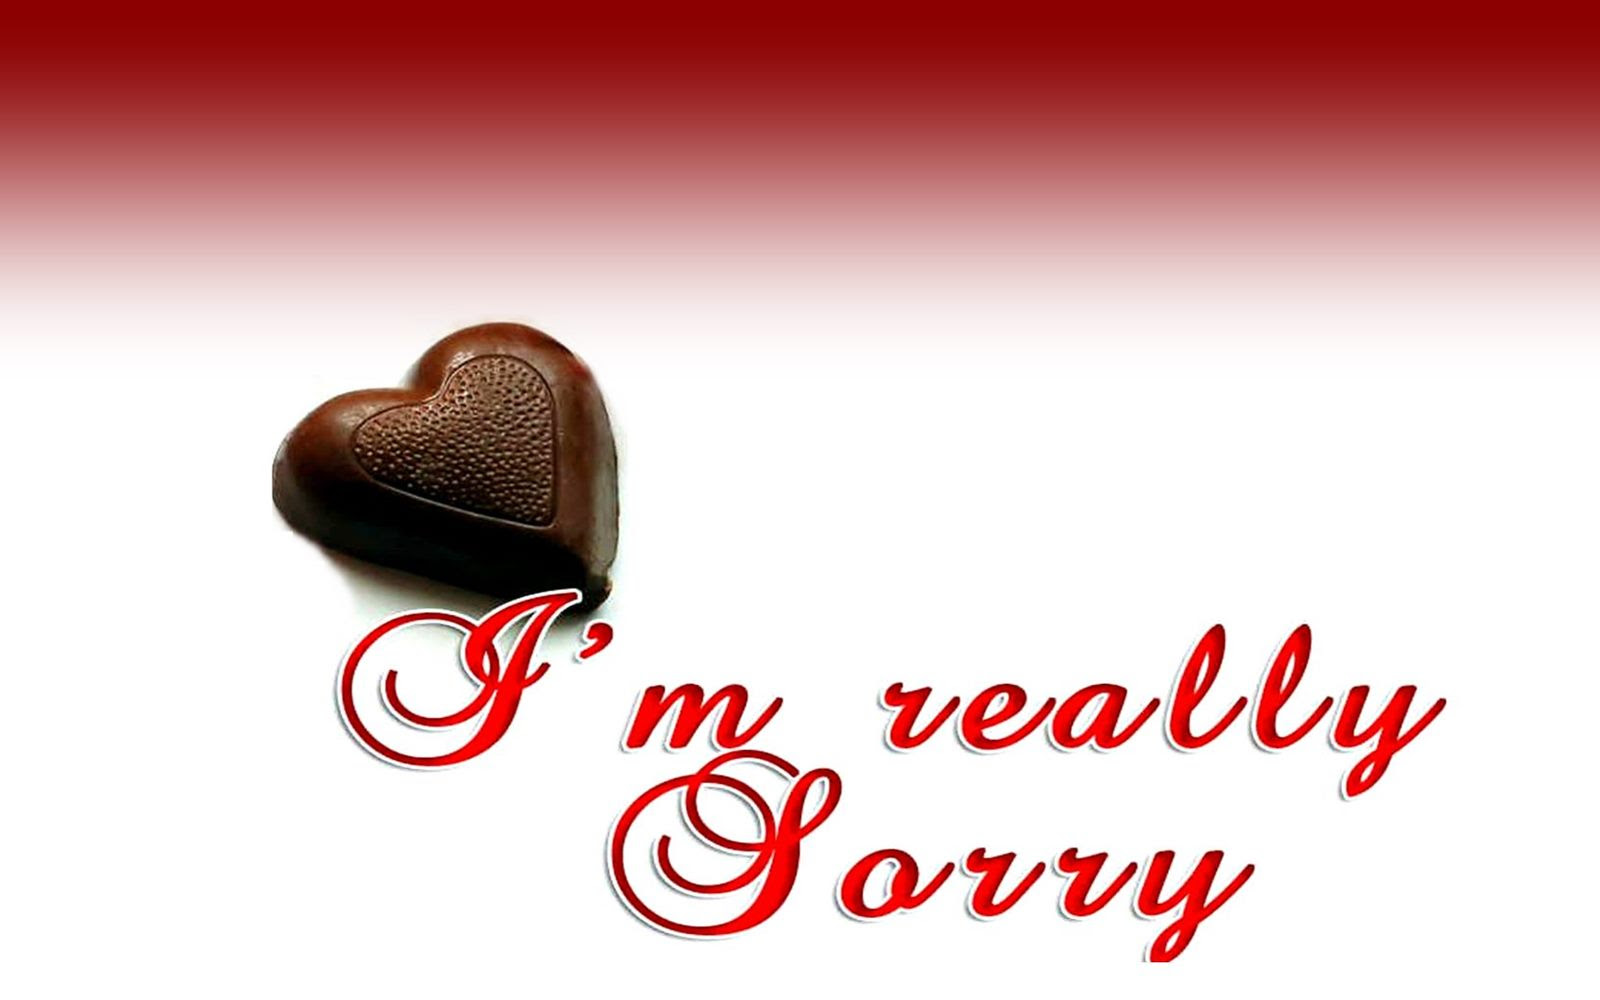 I Am Really Sorry Quotes Hd Wallpaper 04927 Wallpaperspickcom